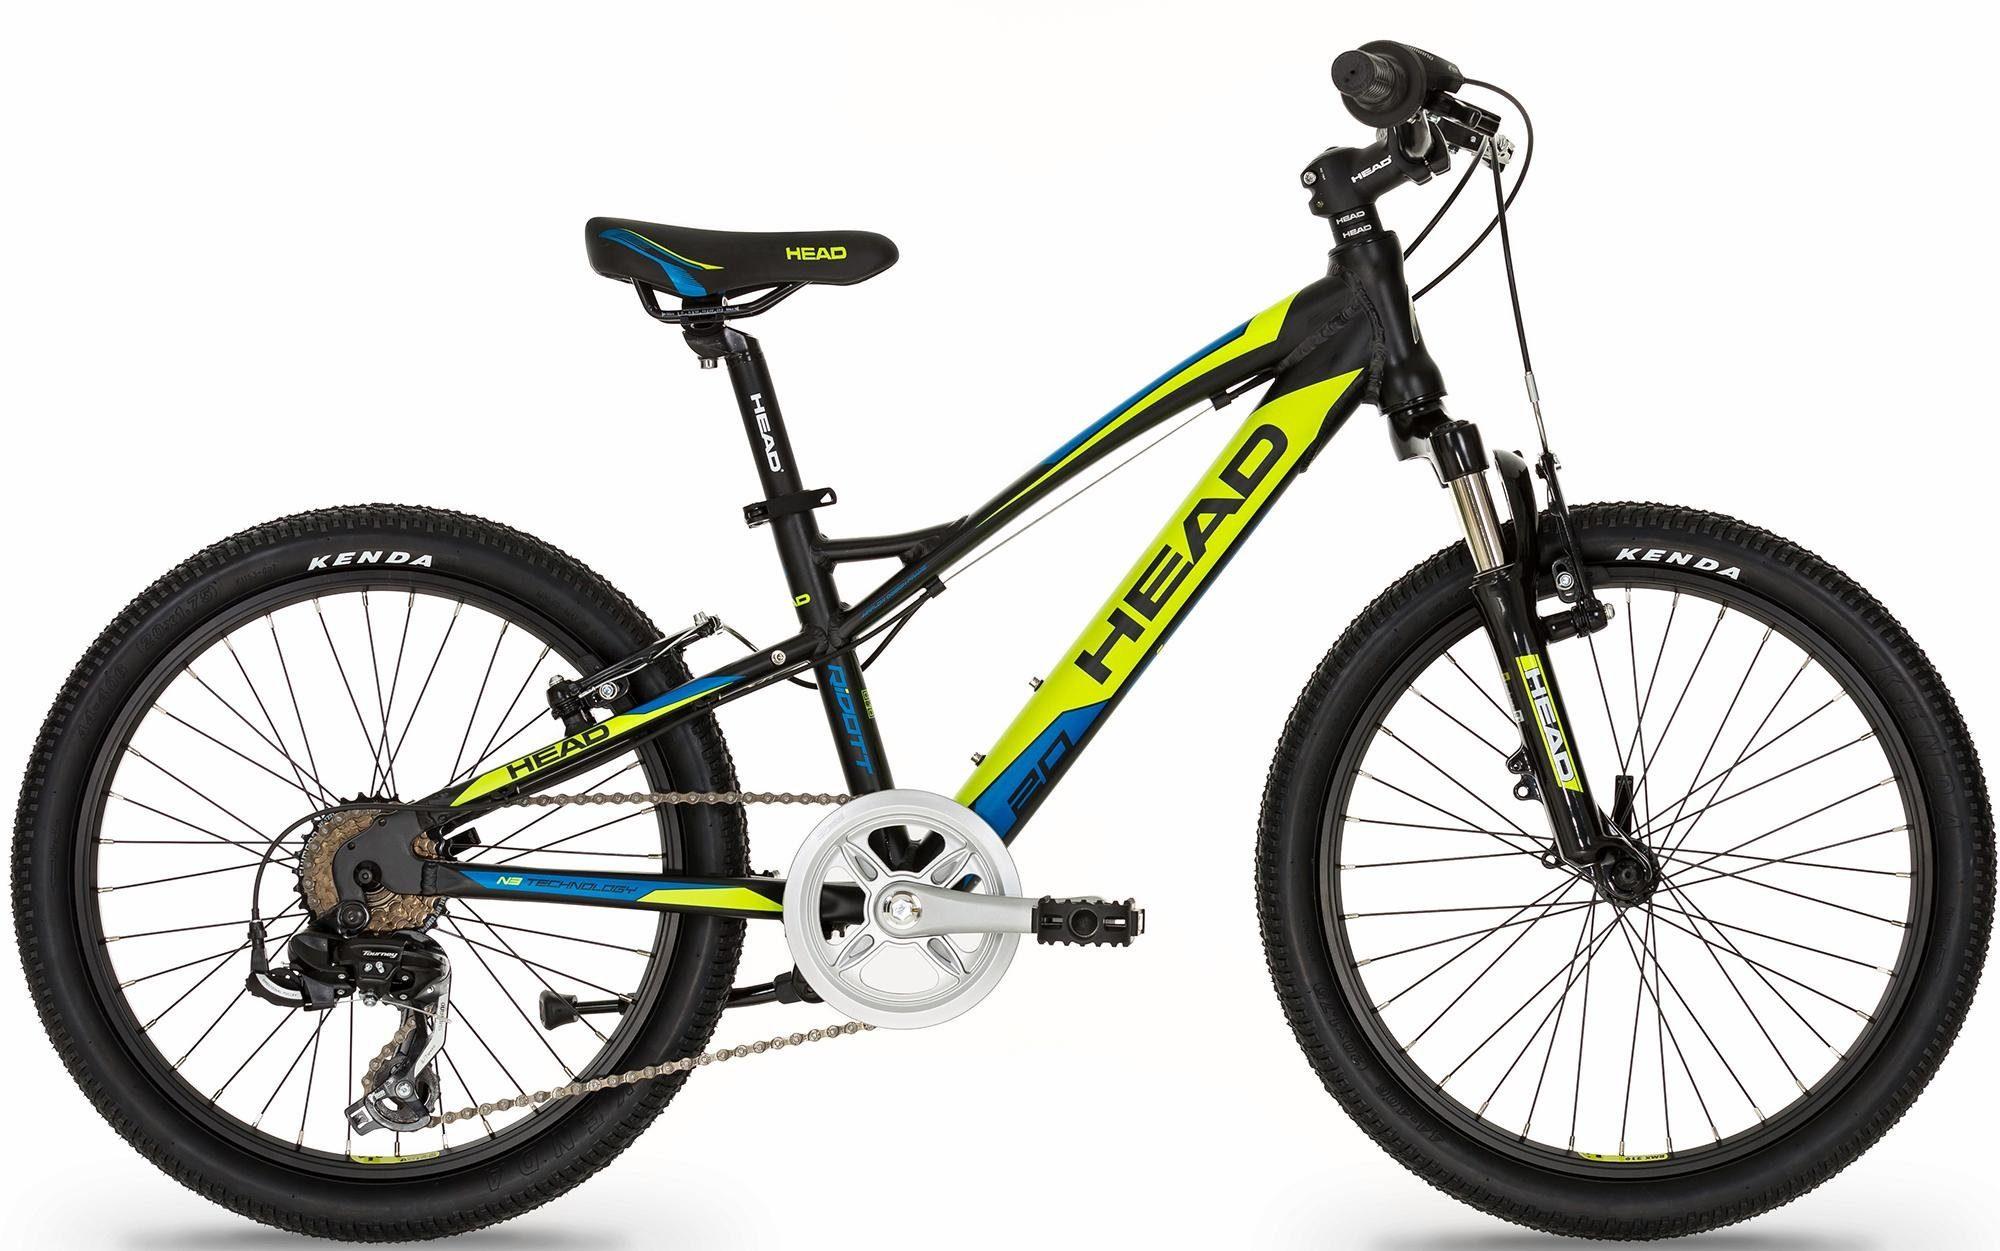 SHIMANO Tourney RD-TX55 schaltwerk MTB fahrrad kettenschaltungen 6 S 7 S 8 S TX55